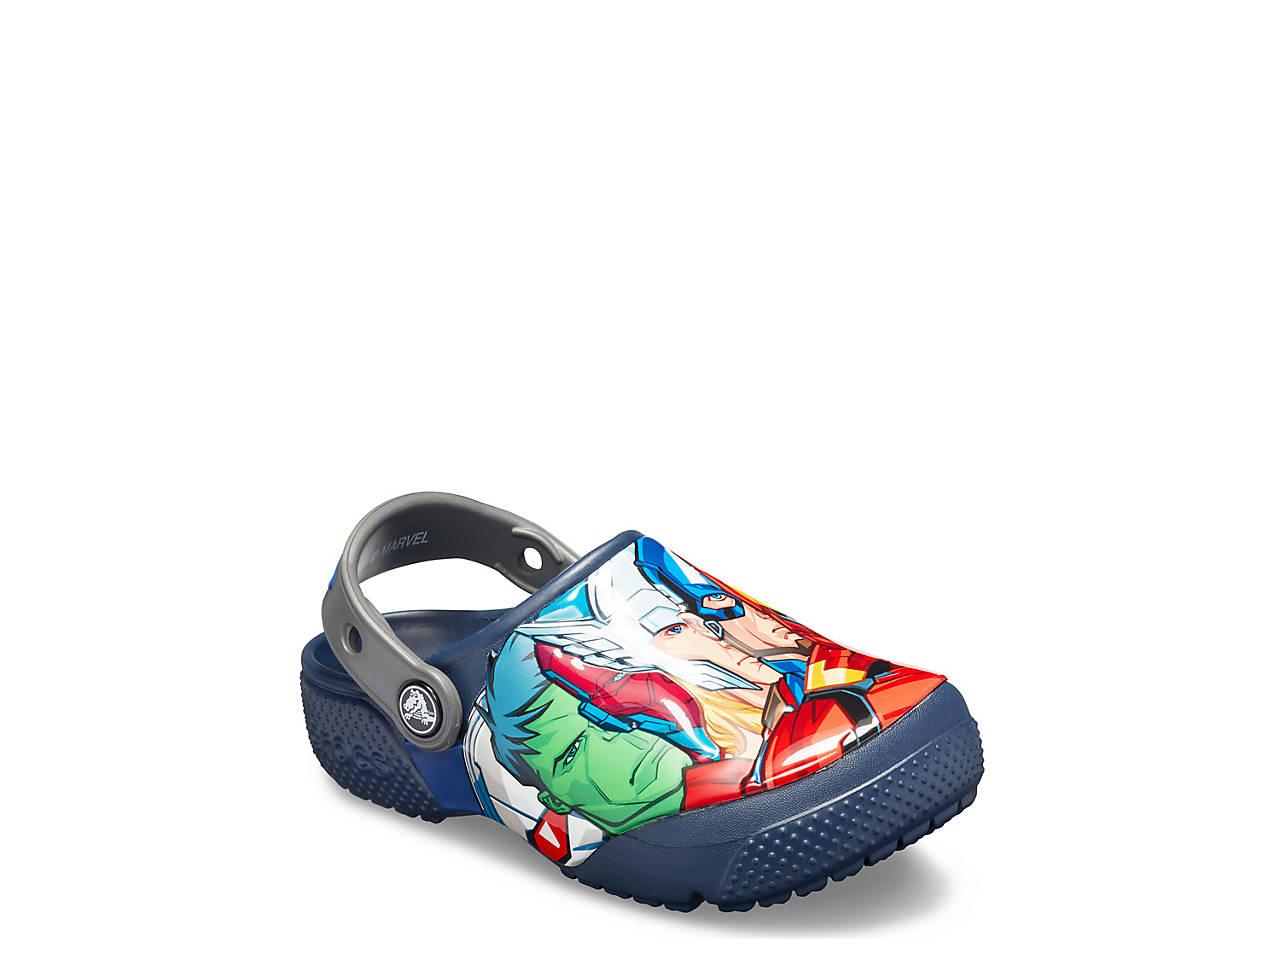 d6c31502e24eb Crocs Funlab Marvel Toddler & Youth Clog Kids Shoes | DSW